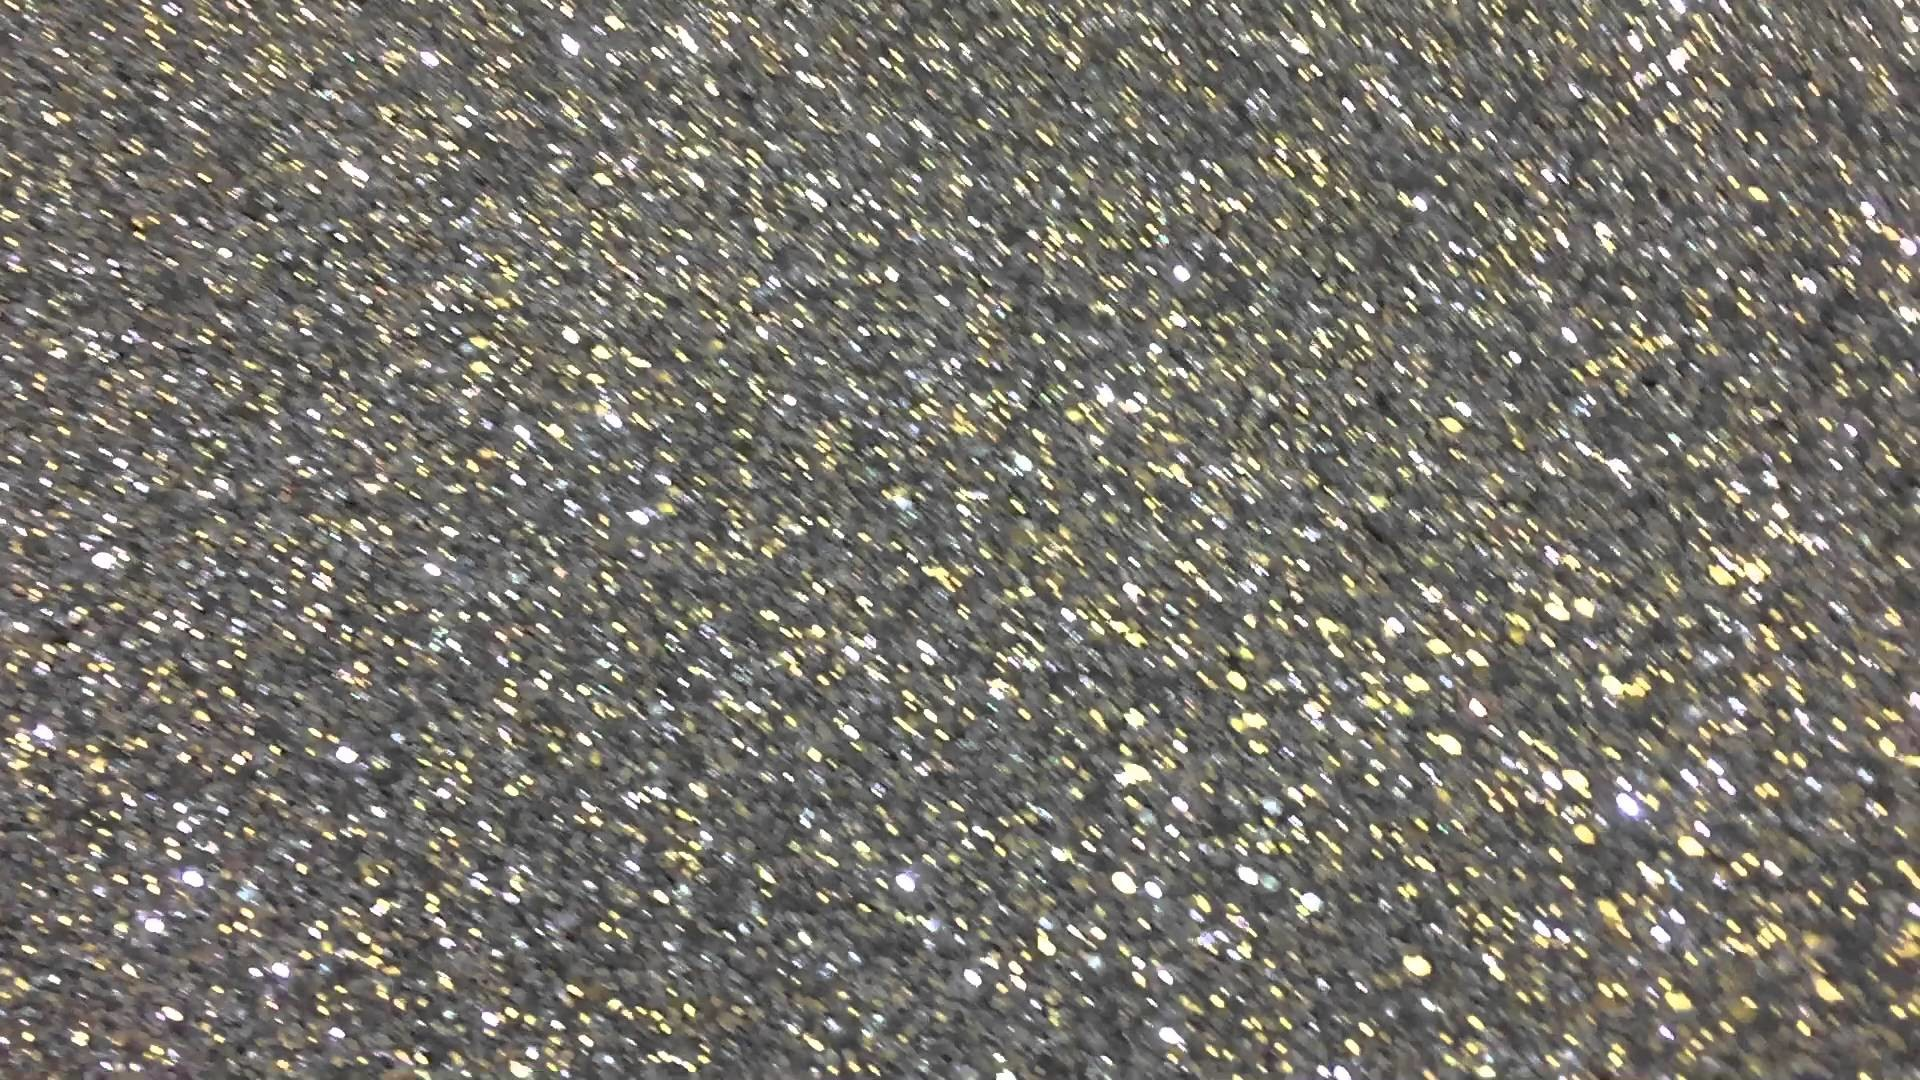 Silver Glitter Wallpaper: Shades of Silver/Black   Glitter Wallpaper &  Wallcoverings